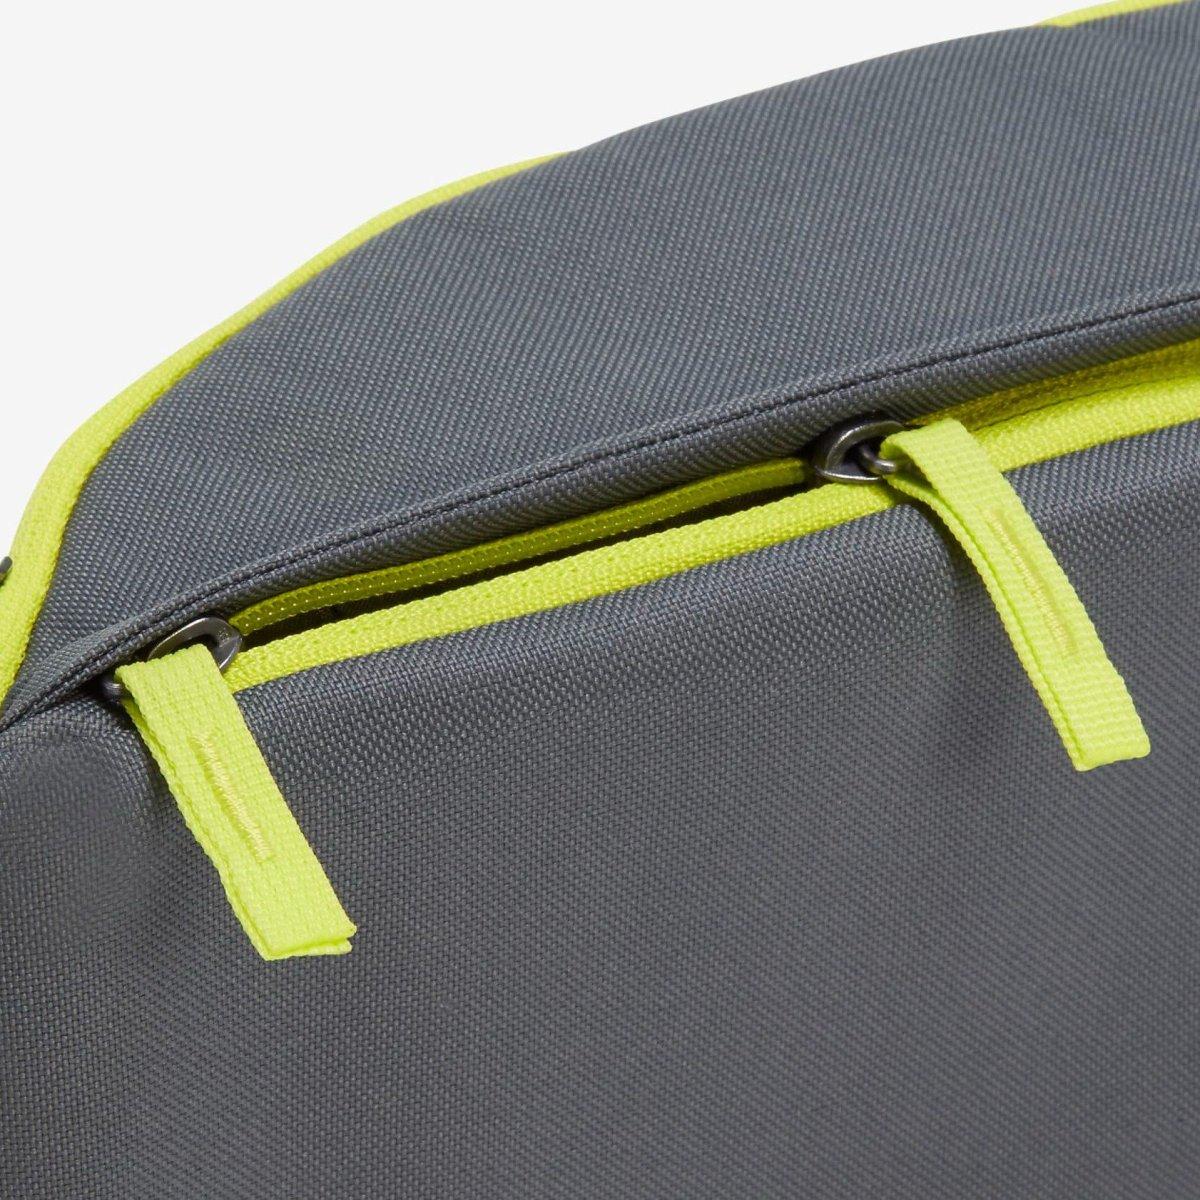 Nike-Heritage-Fanny-pack-Iron-Grey-Cyber-Green-BA5750-068-5_1024x1024@2x